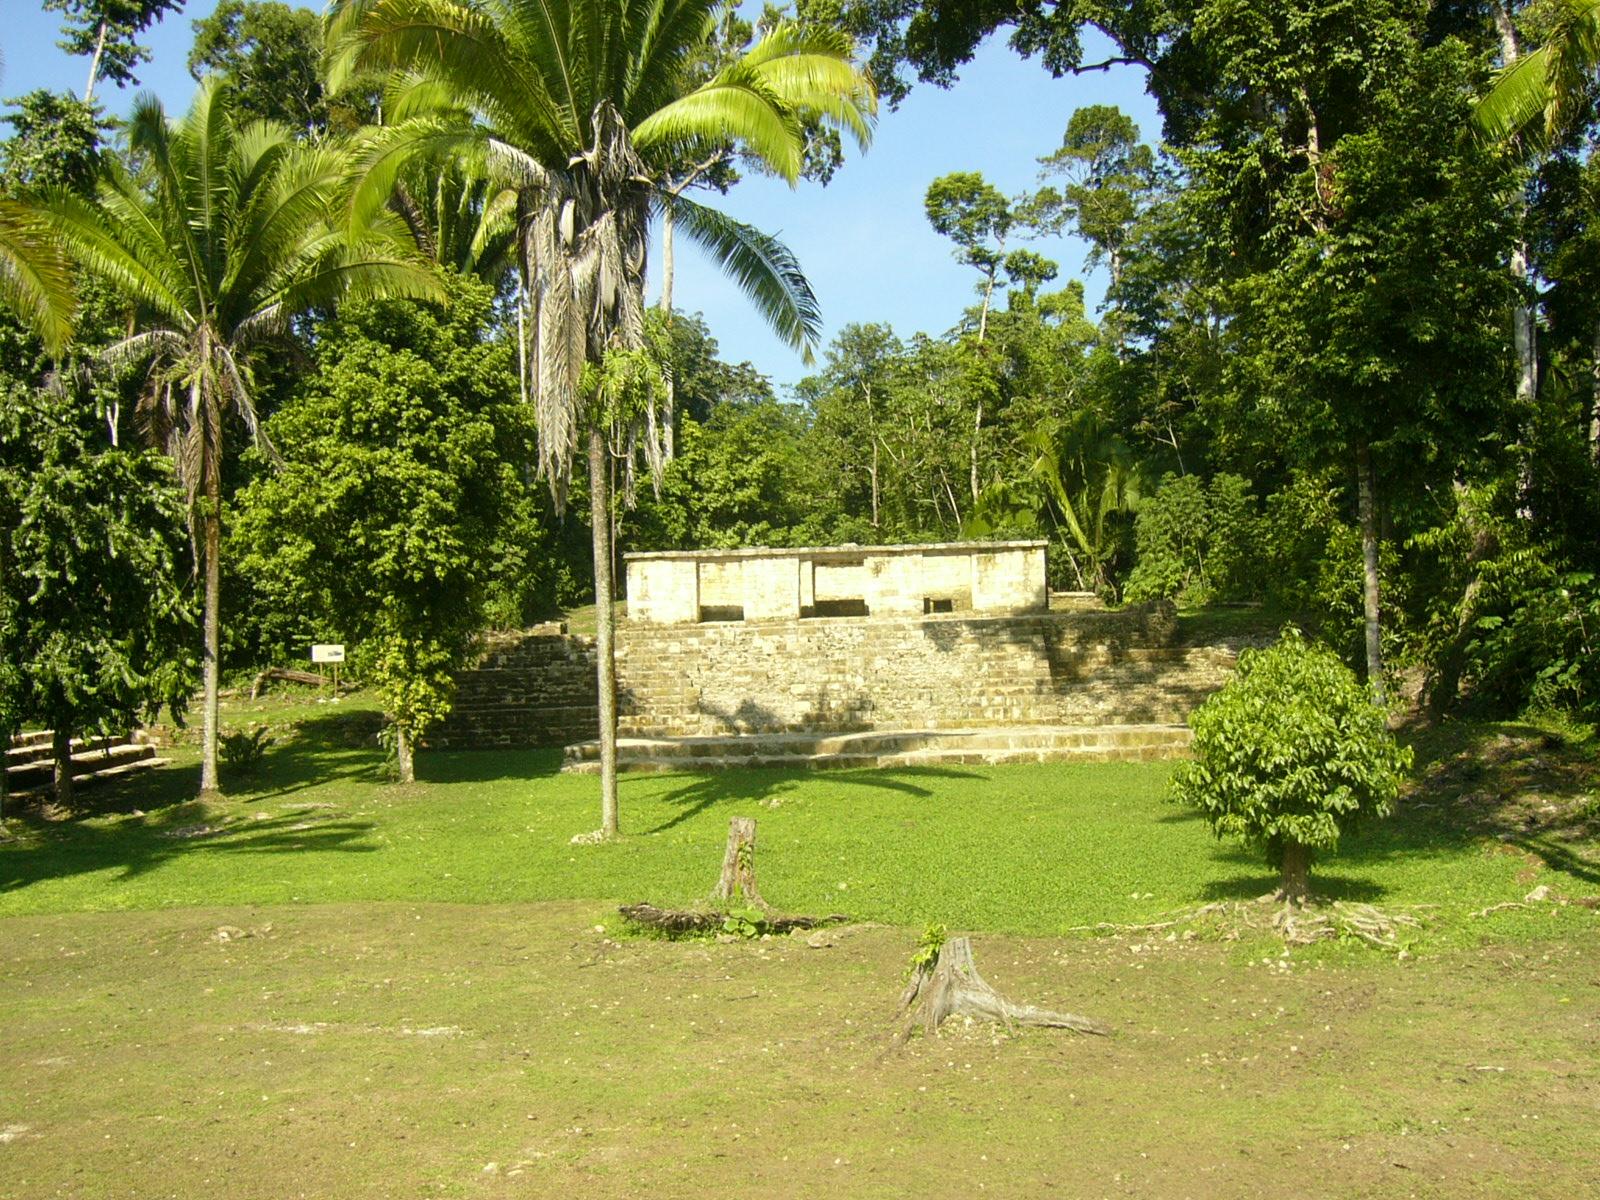 Aguateca-temple